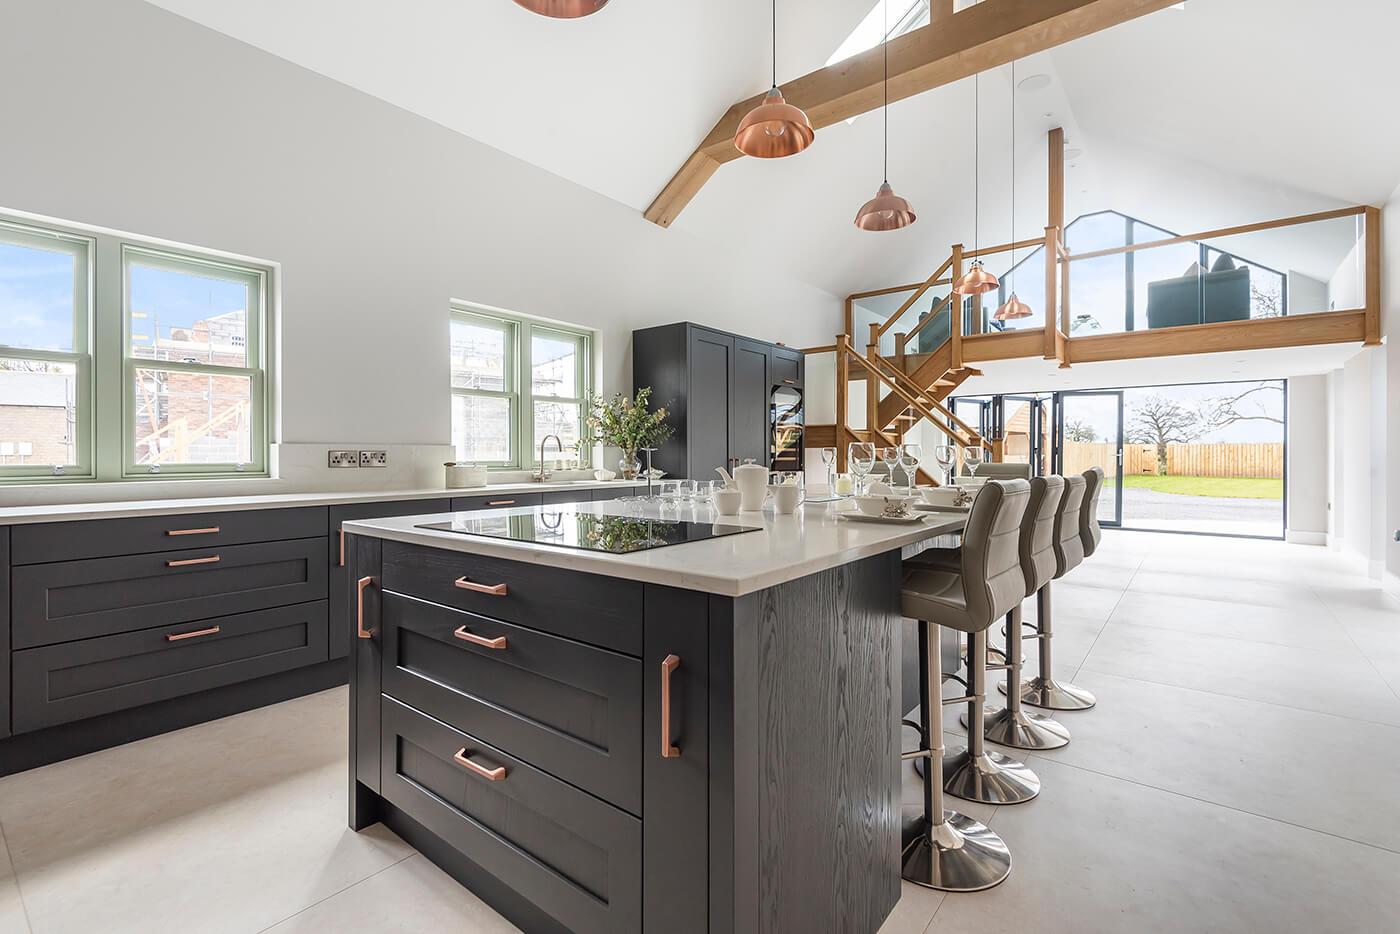 Harmby Homes - Barley Court, Staveley The Brocket kitchen